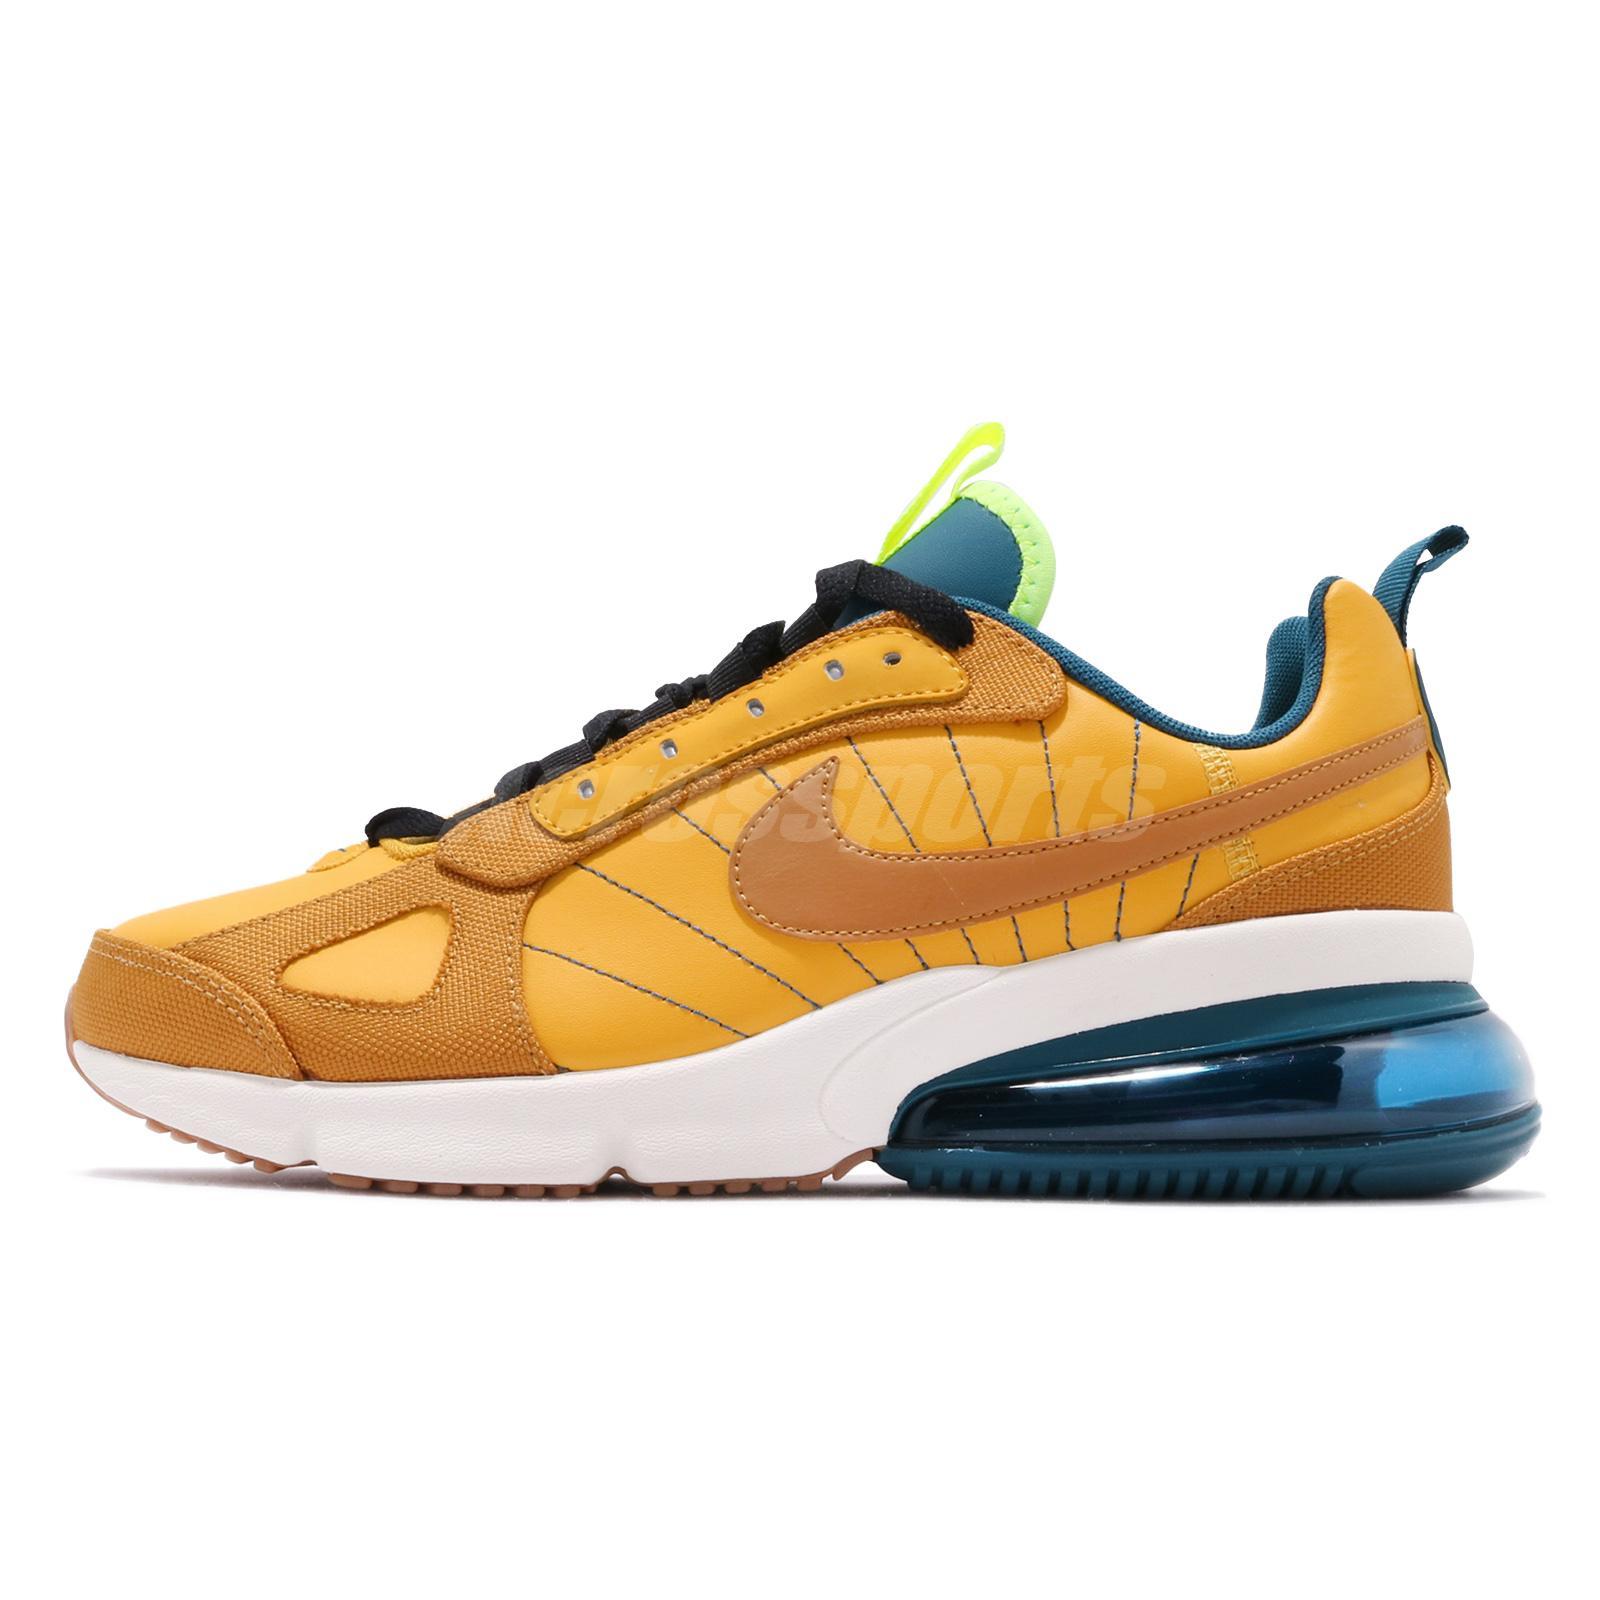 Details about Nike Air Max 270 Futura SE Yellow Ochre Desert Men Running Shoes AV2151 700